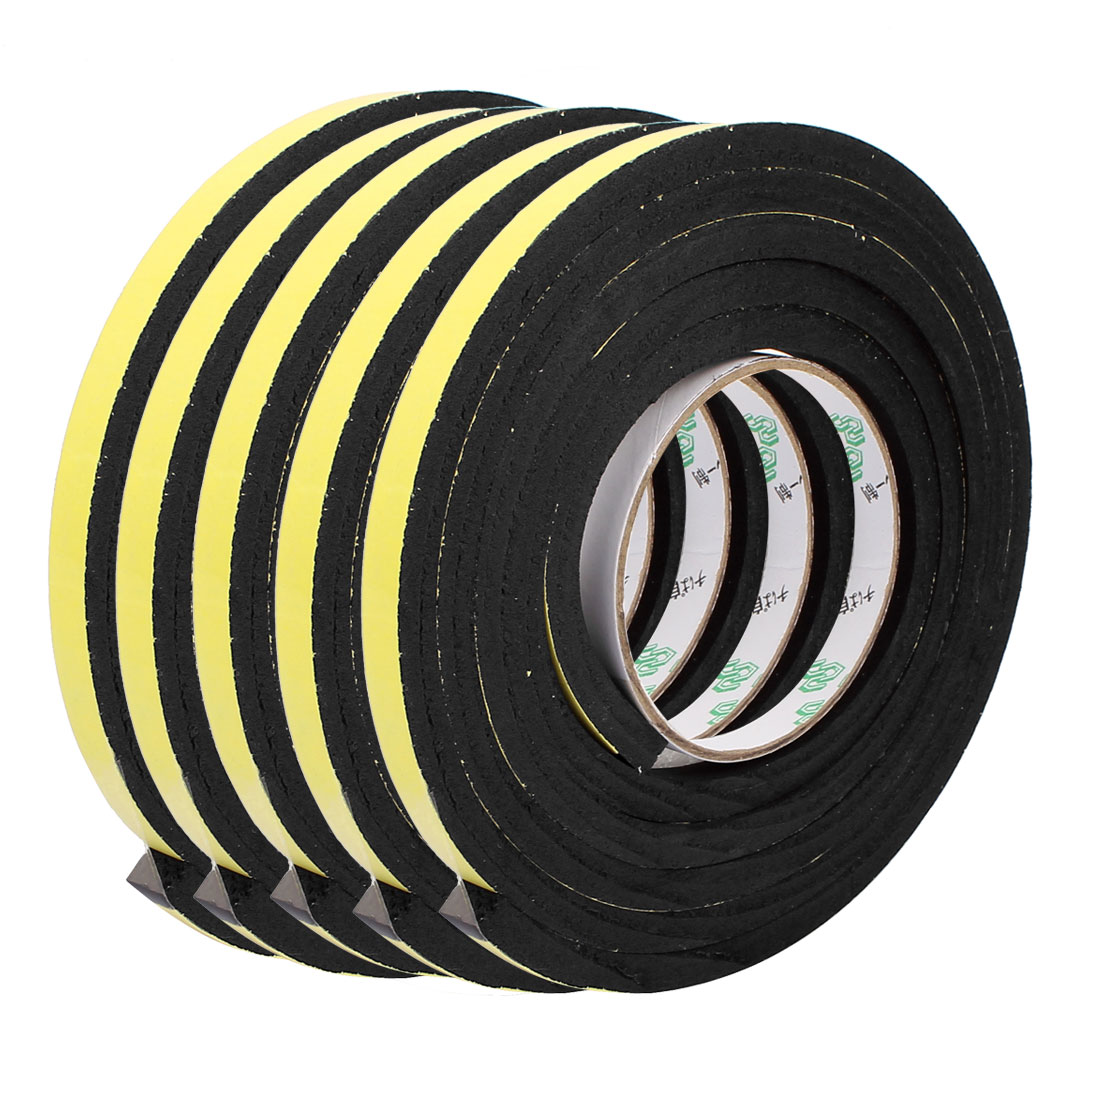 5pcs 10mm x 8mm Single Sided Self Adhesive Shockproof Sponge Foam Tape 2M Length